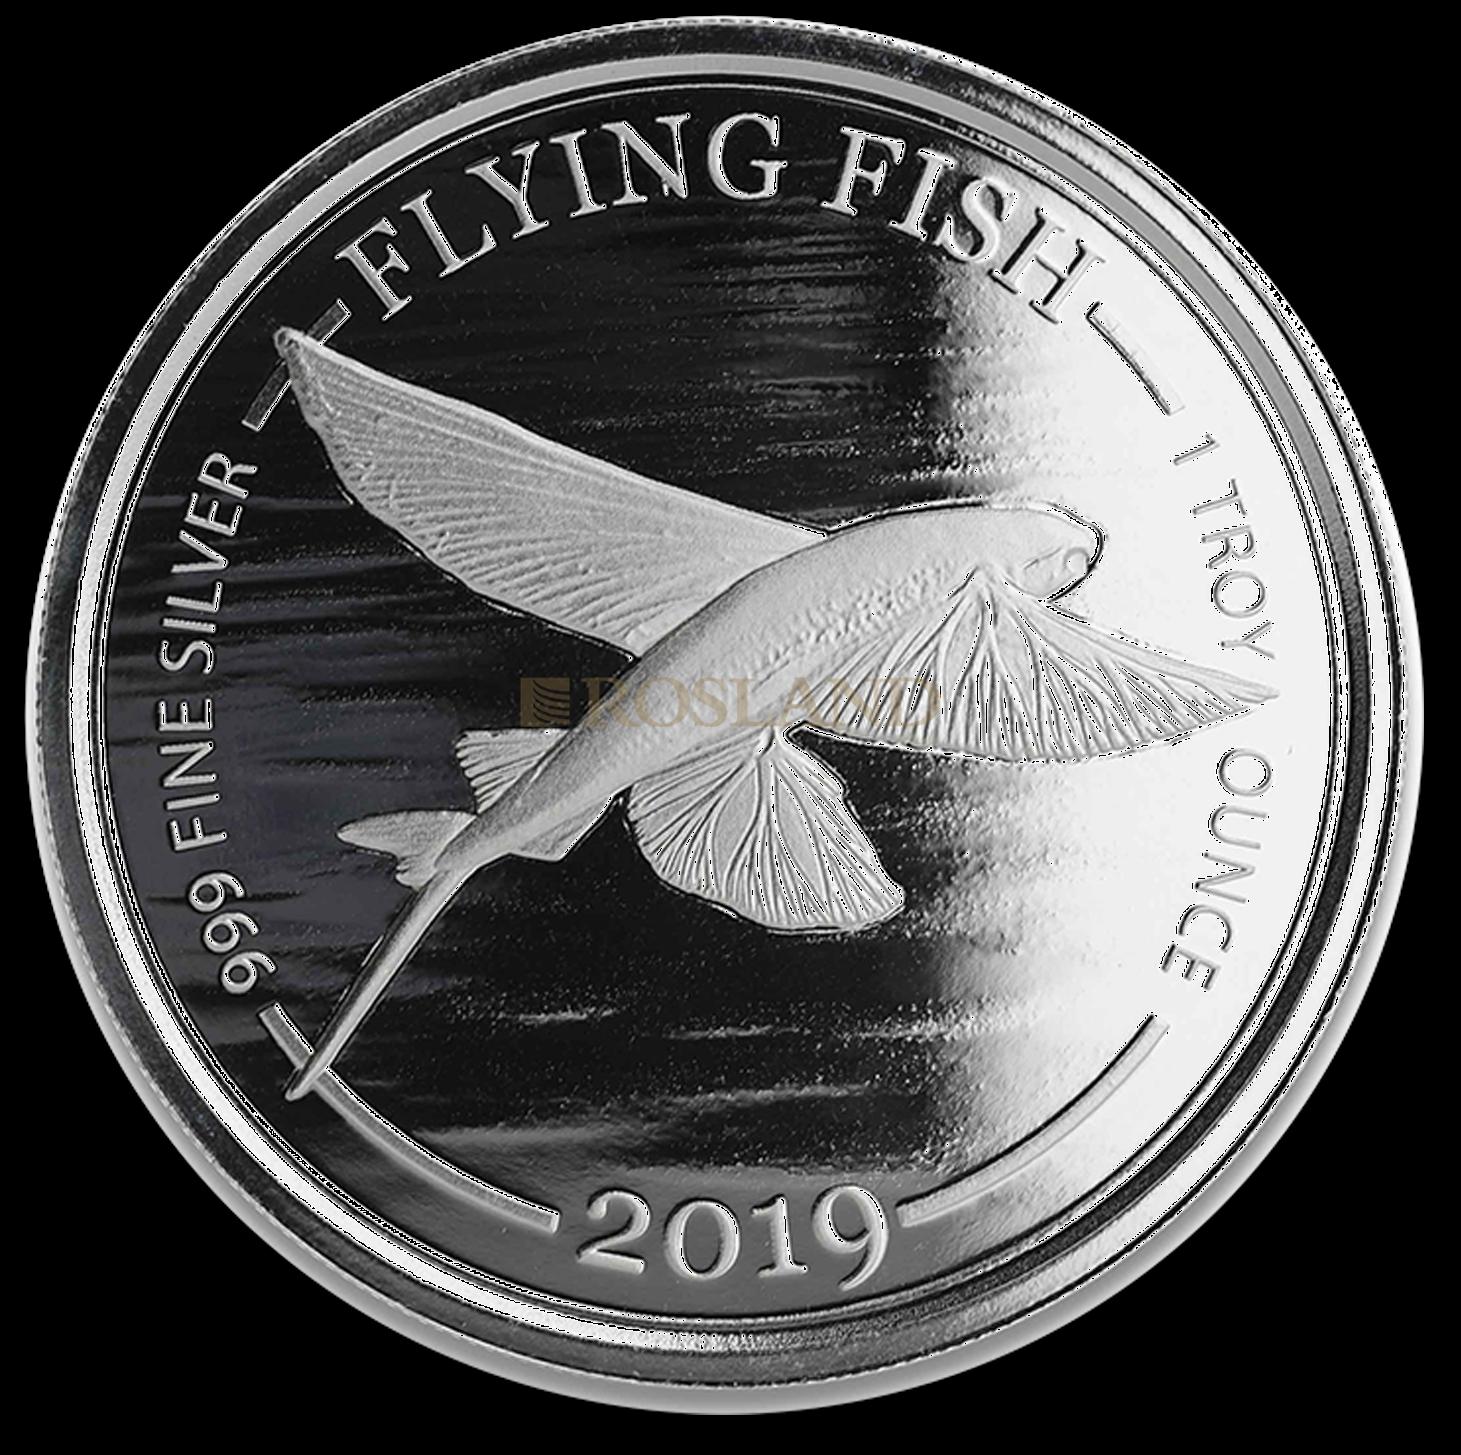 1 Unze Silbermünze Barbados Flying Fish 2019